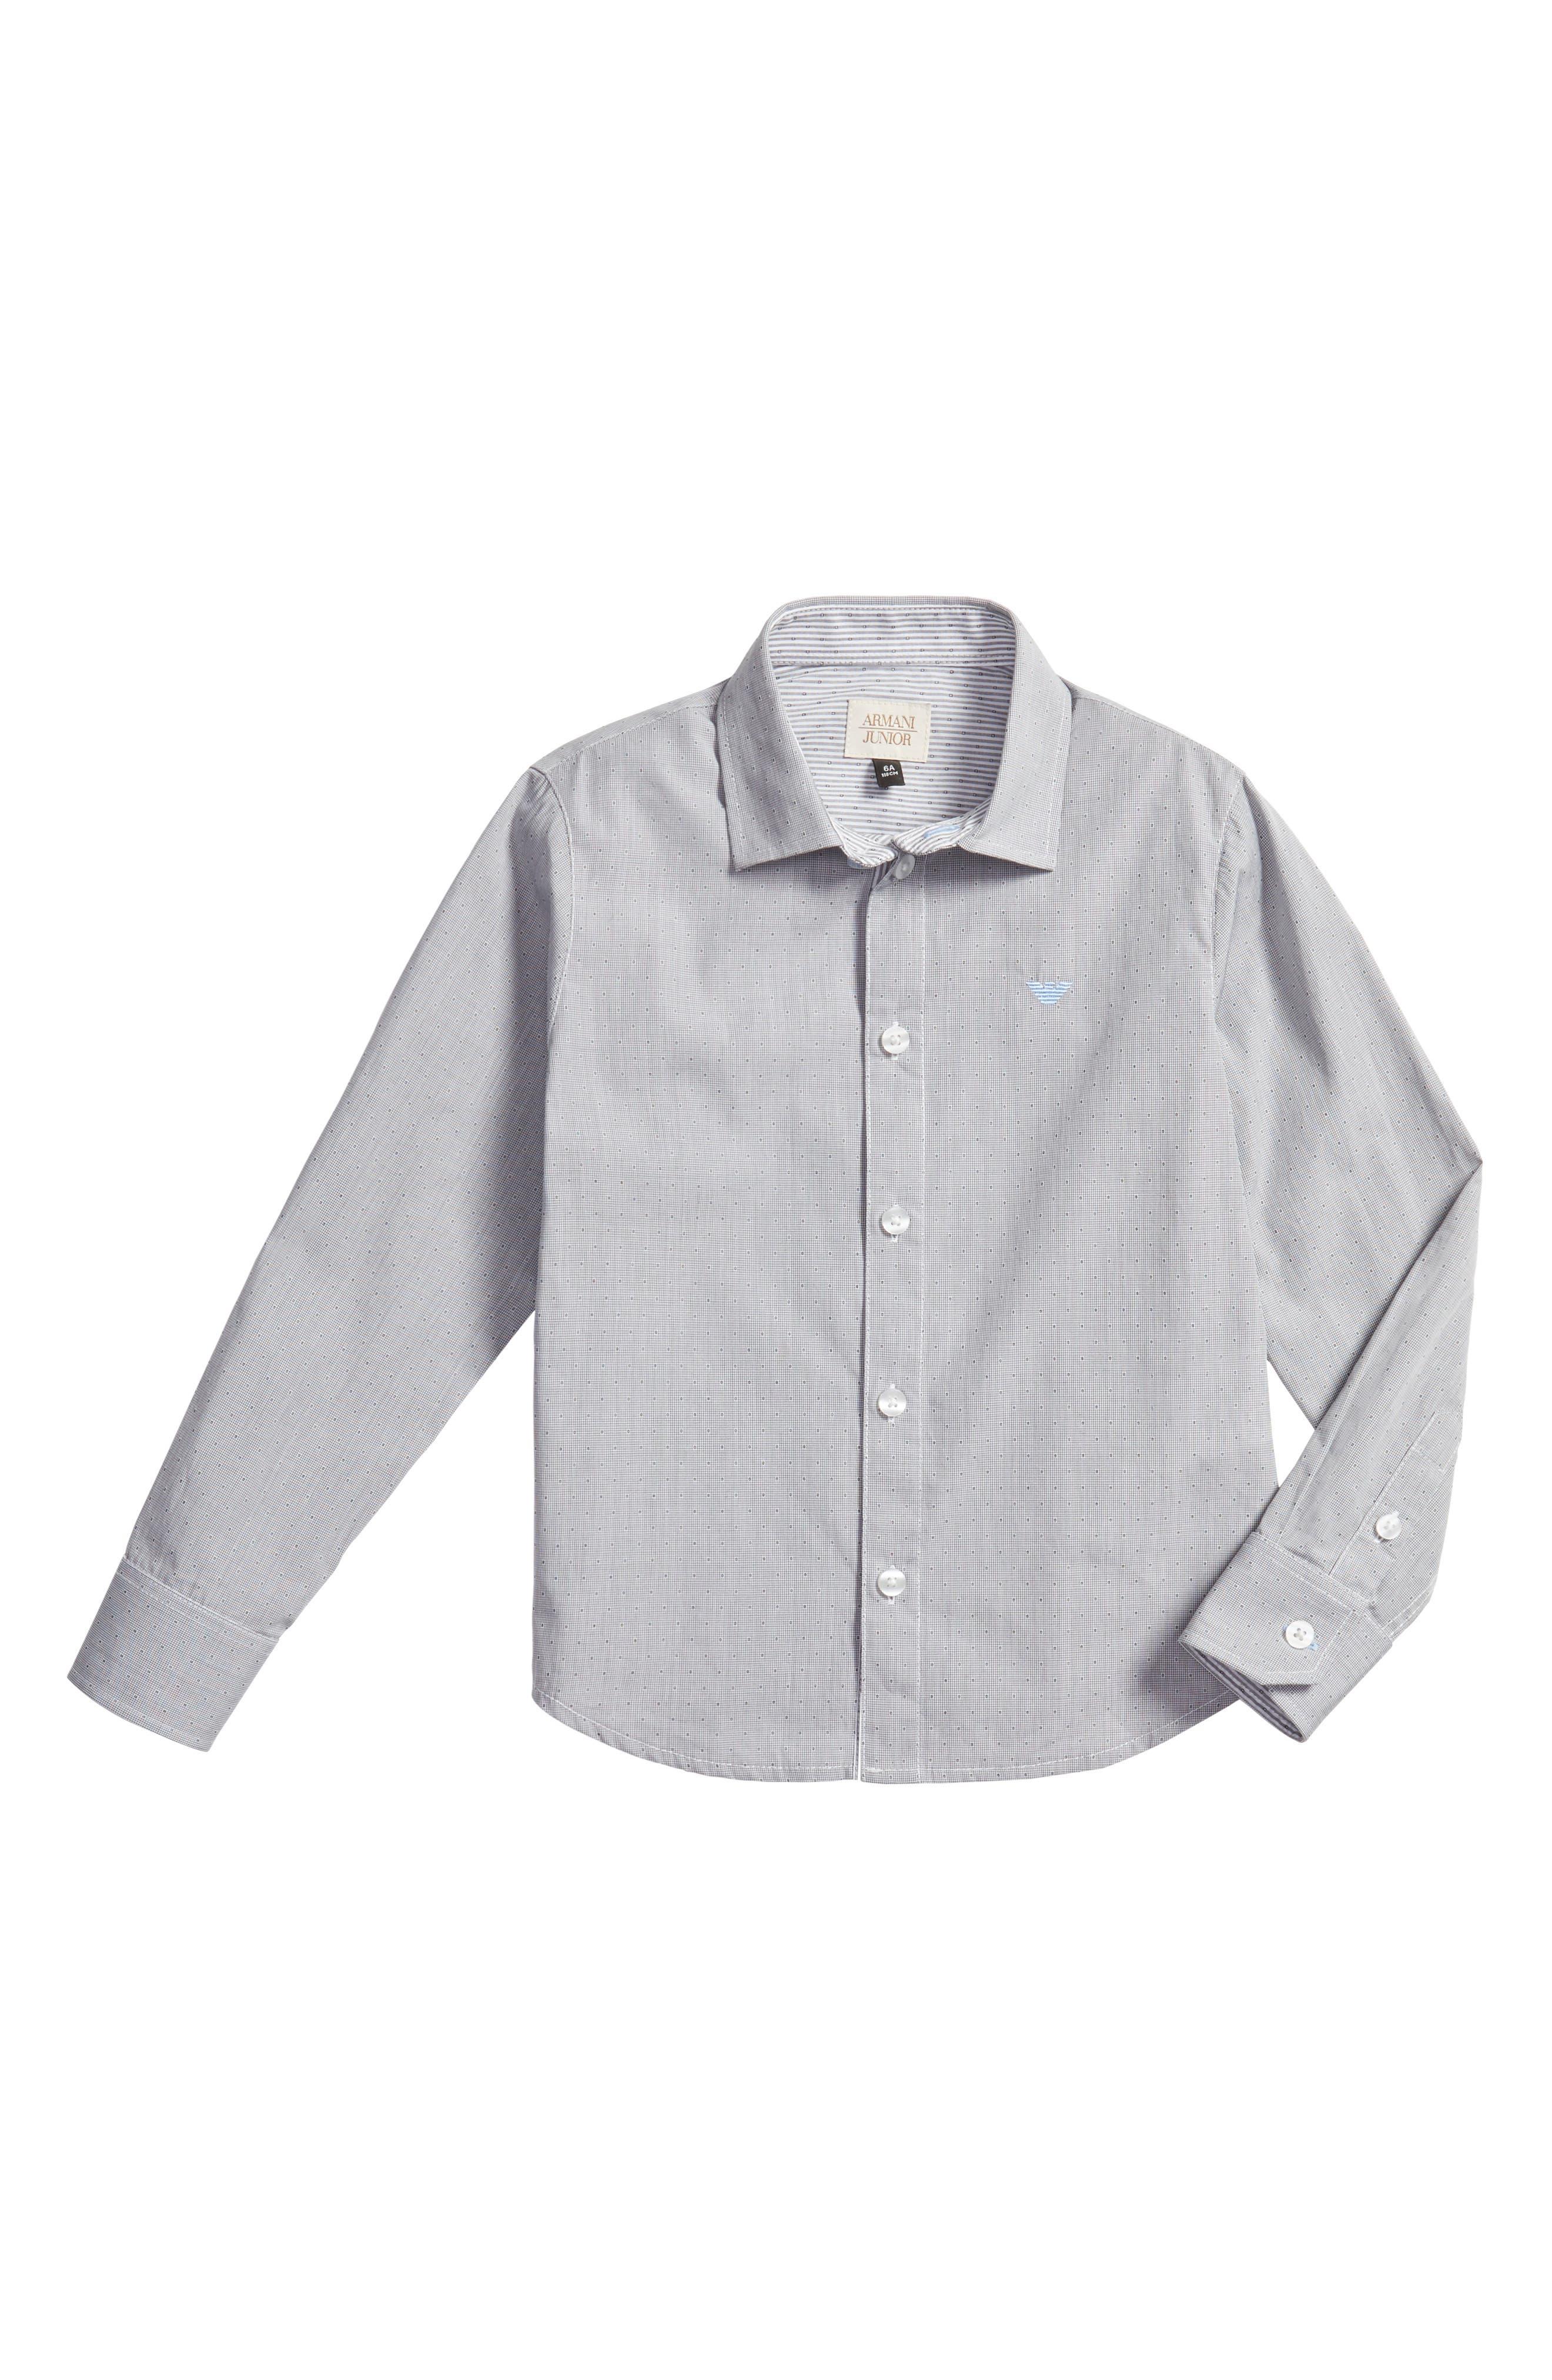 Alternate Image 1 Selected - Armani Junior Stripe Dress Shirt (Little Boys & Big Boys)